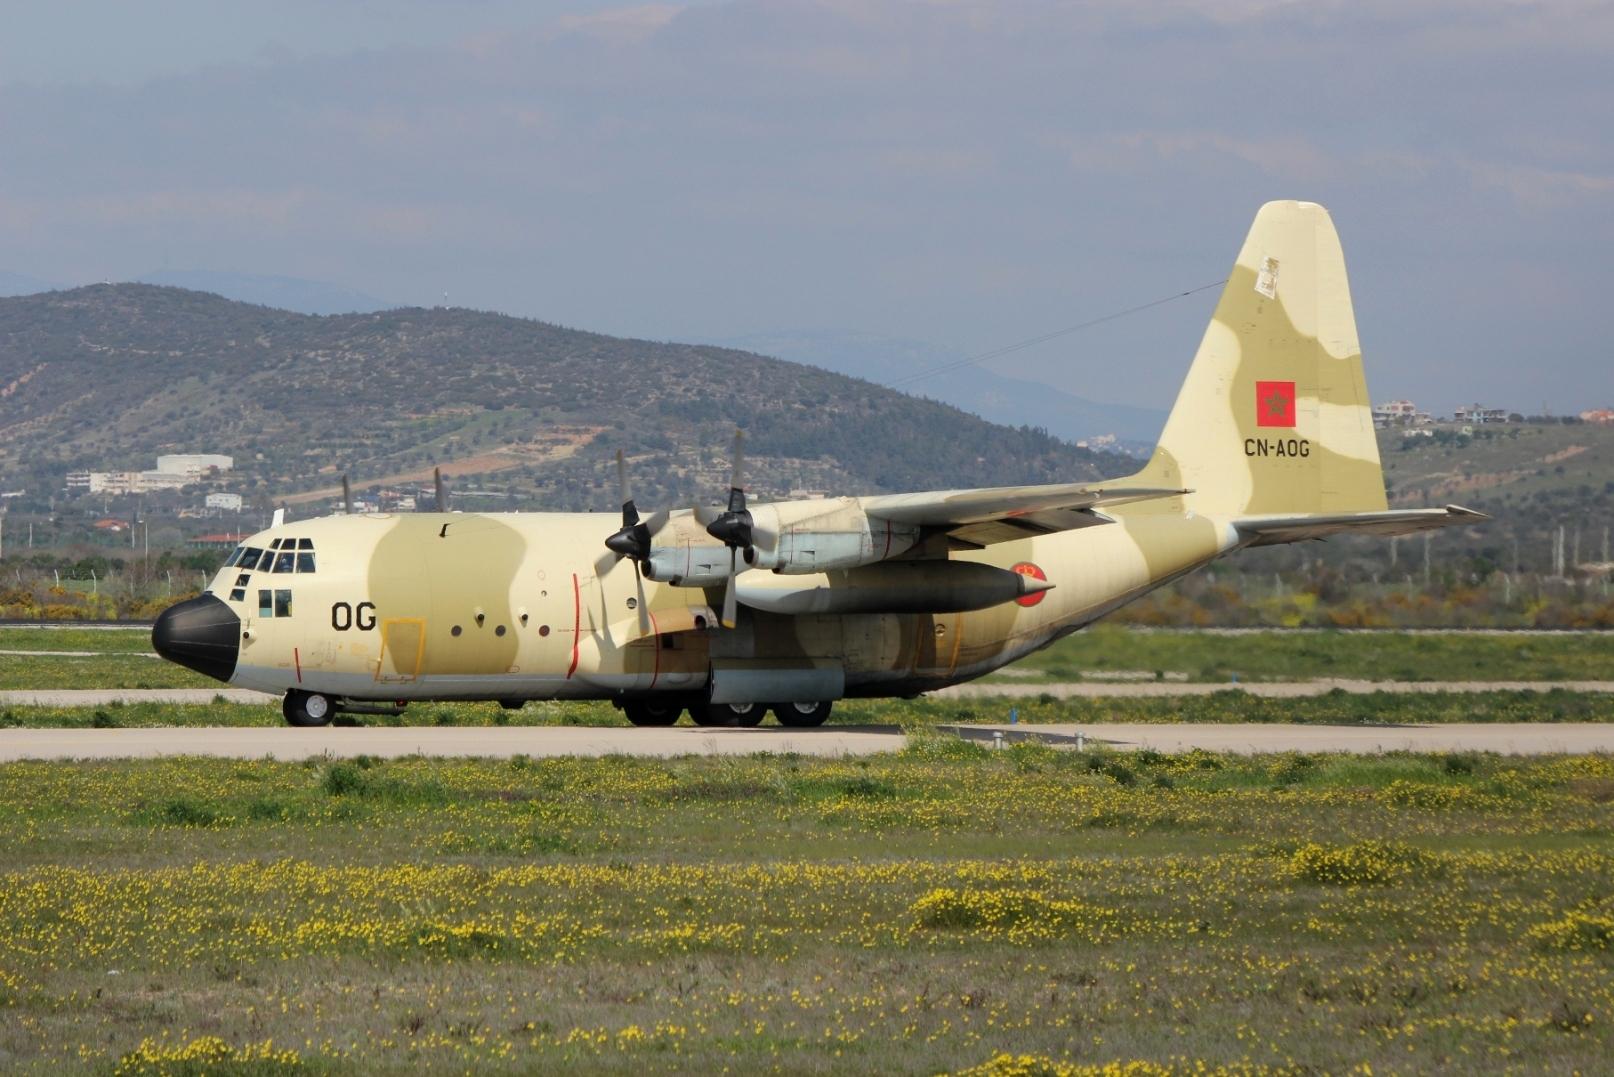 FRA: Photos d'avions de transport - Page 31 33322689140_7781a130fc_o